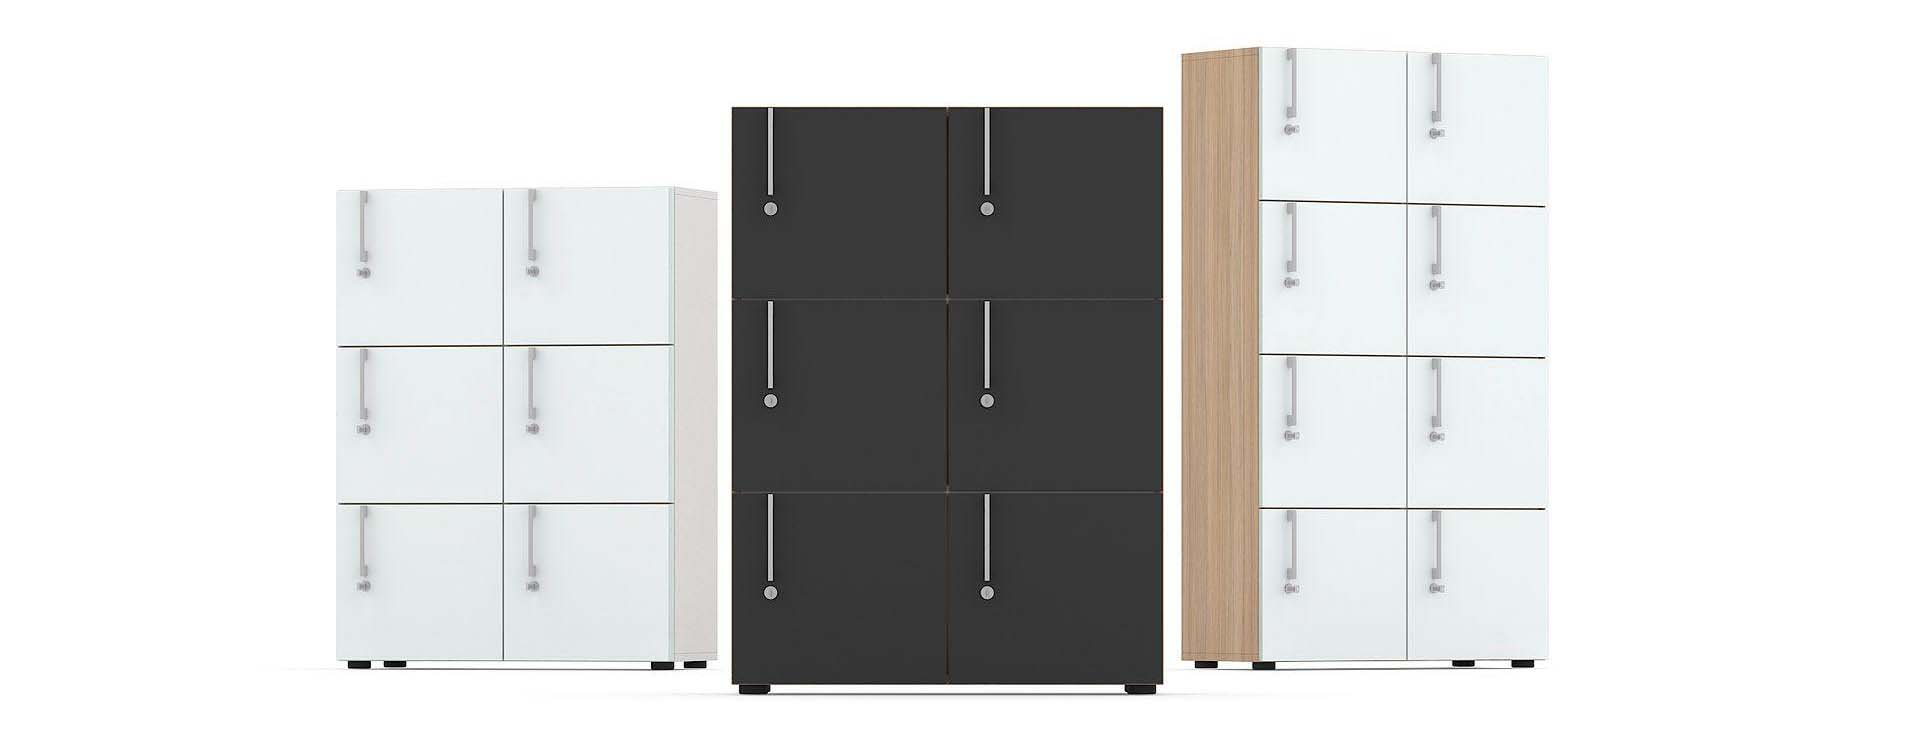 Storage-lockers-NOVA-Narbutas-1920x864